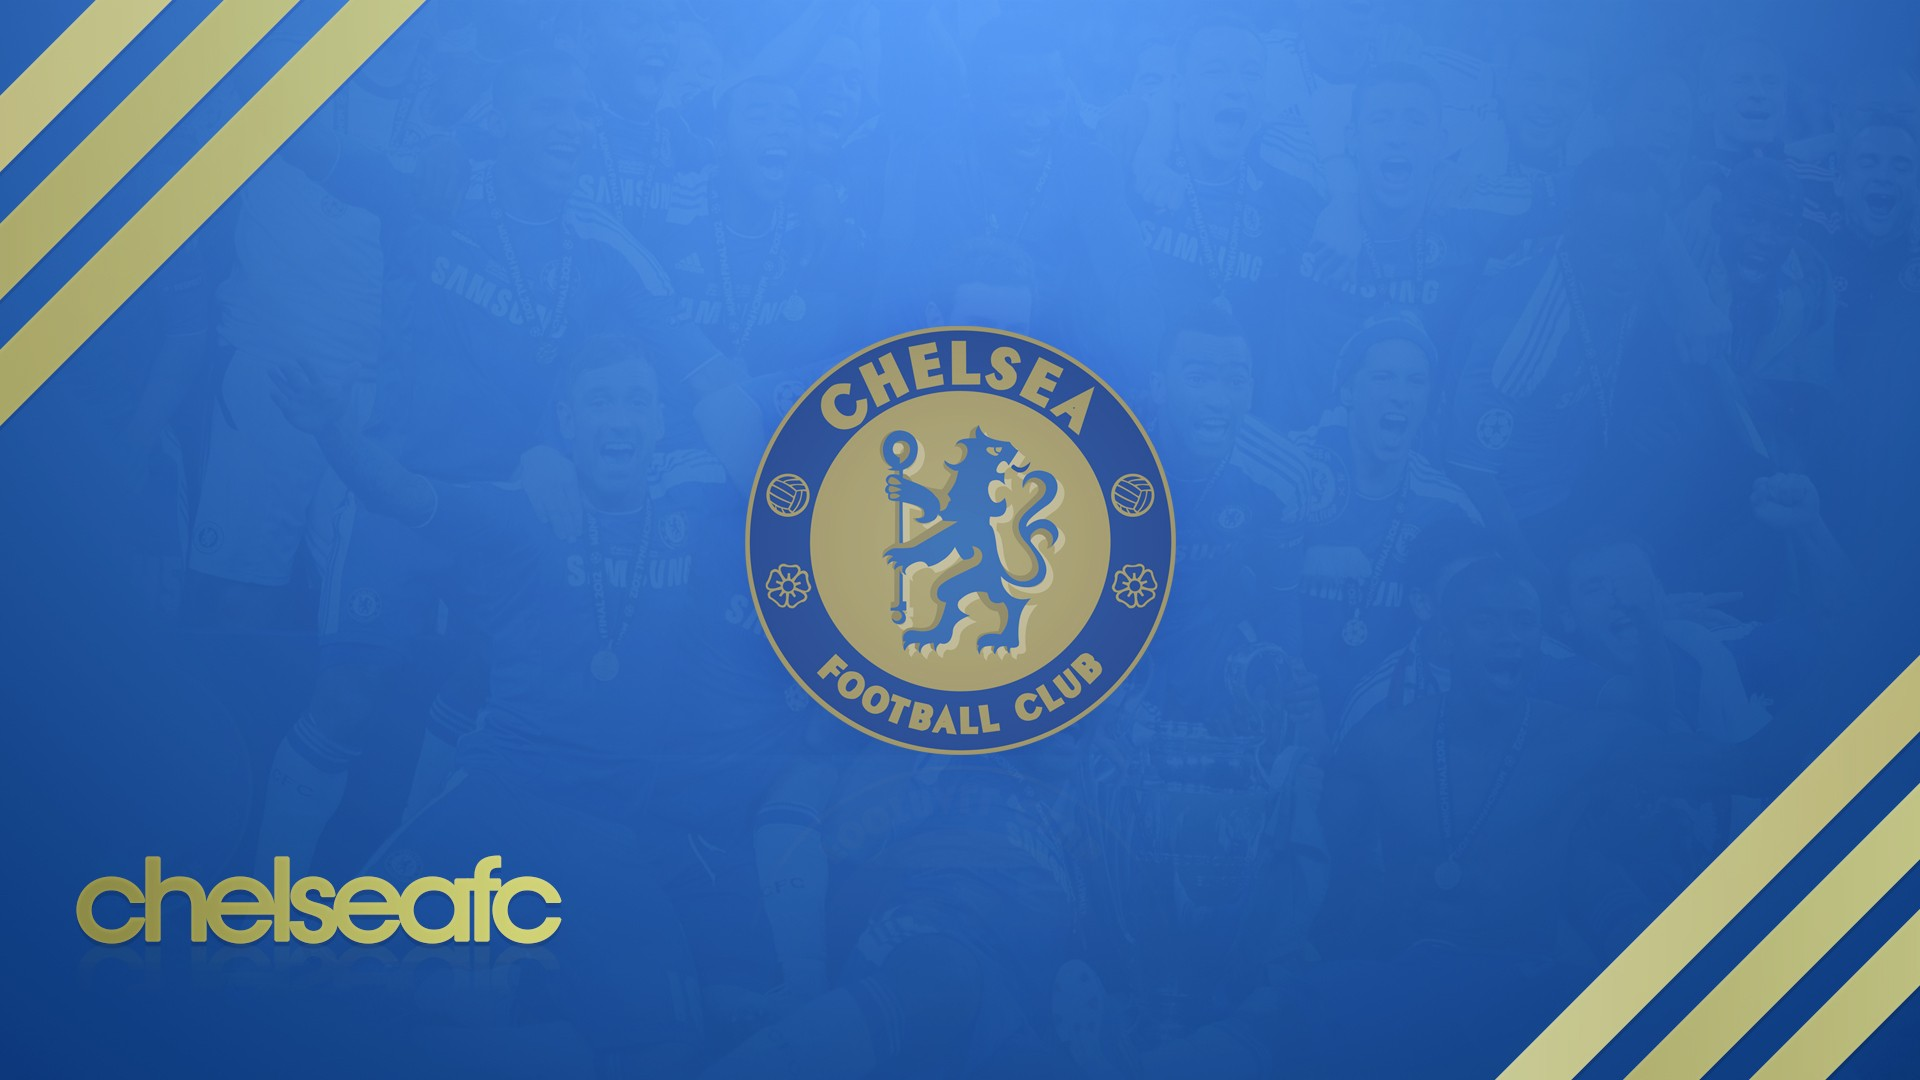 Cool Chelsea Fc Wallpaper Logo For Backgrounds 16359 Wallpaper 1920x1080